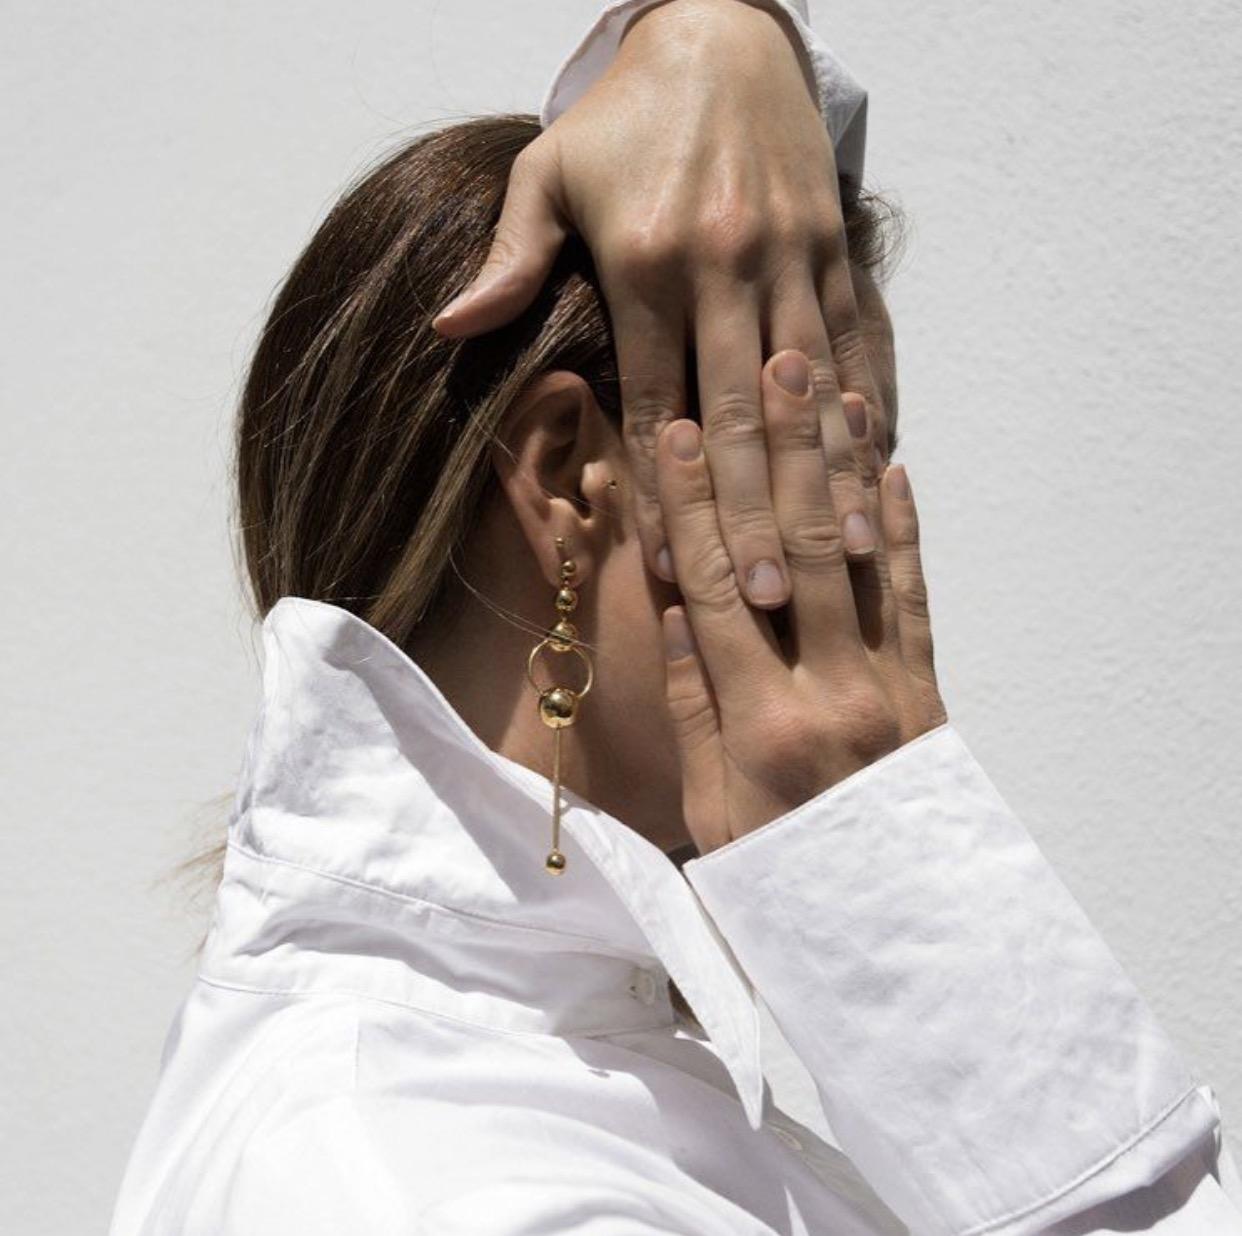 Sarina Suriano, Orbita Earrings  - image via Oracle Fox